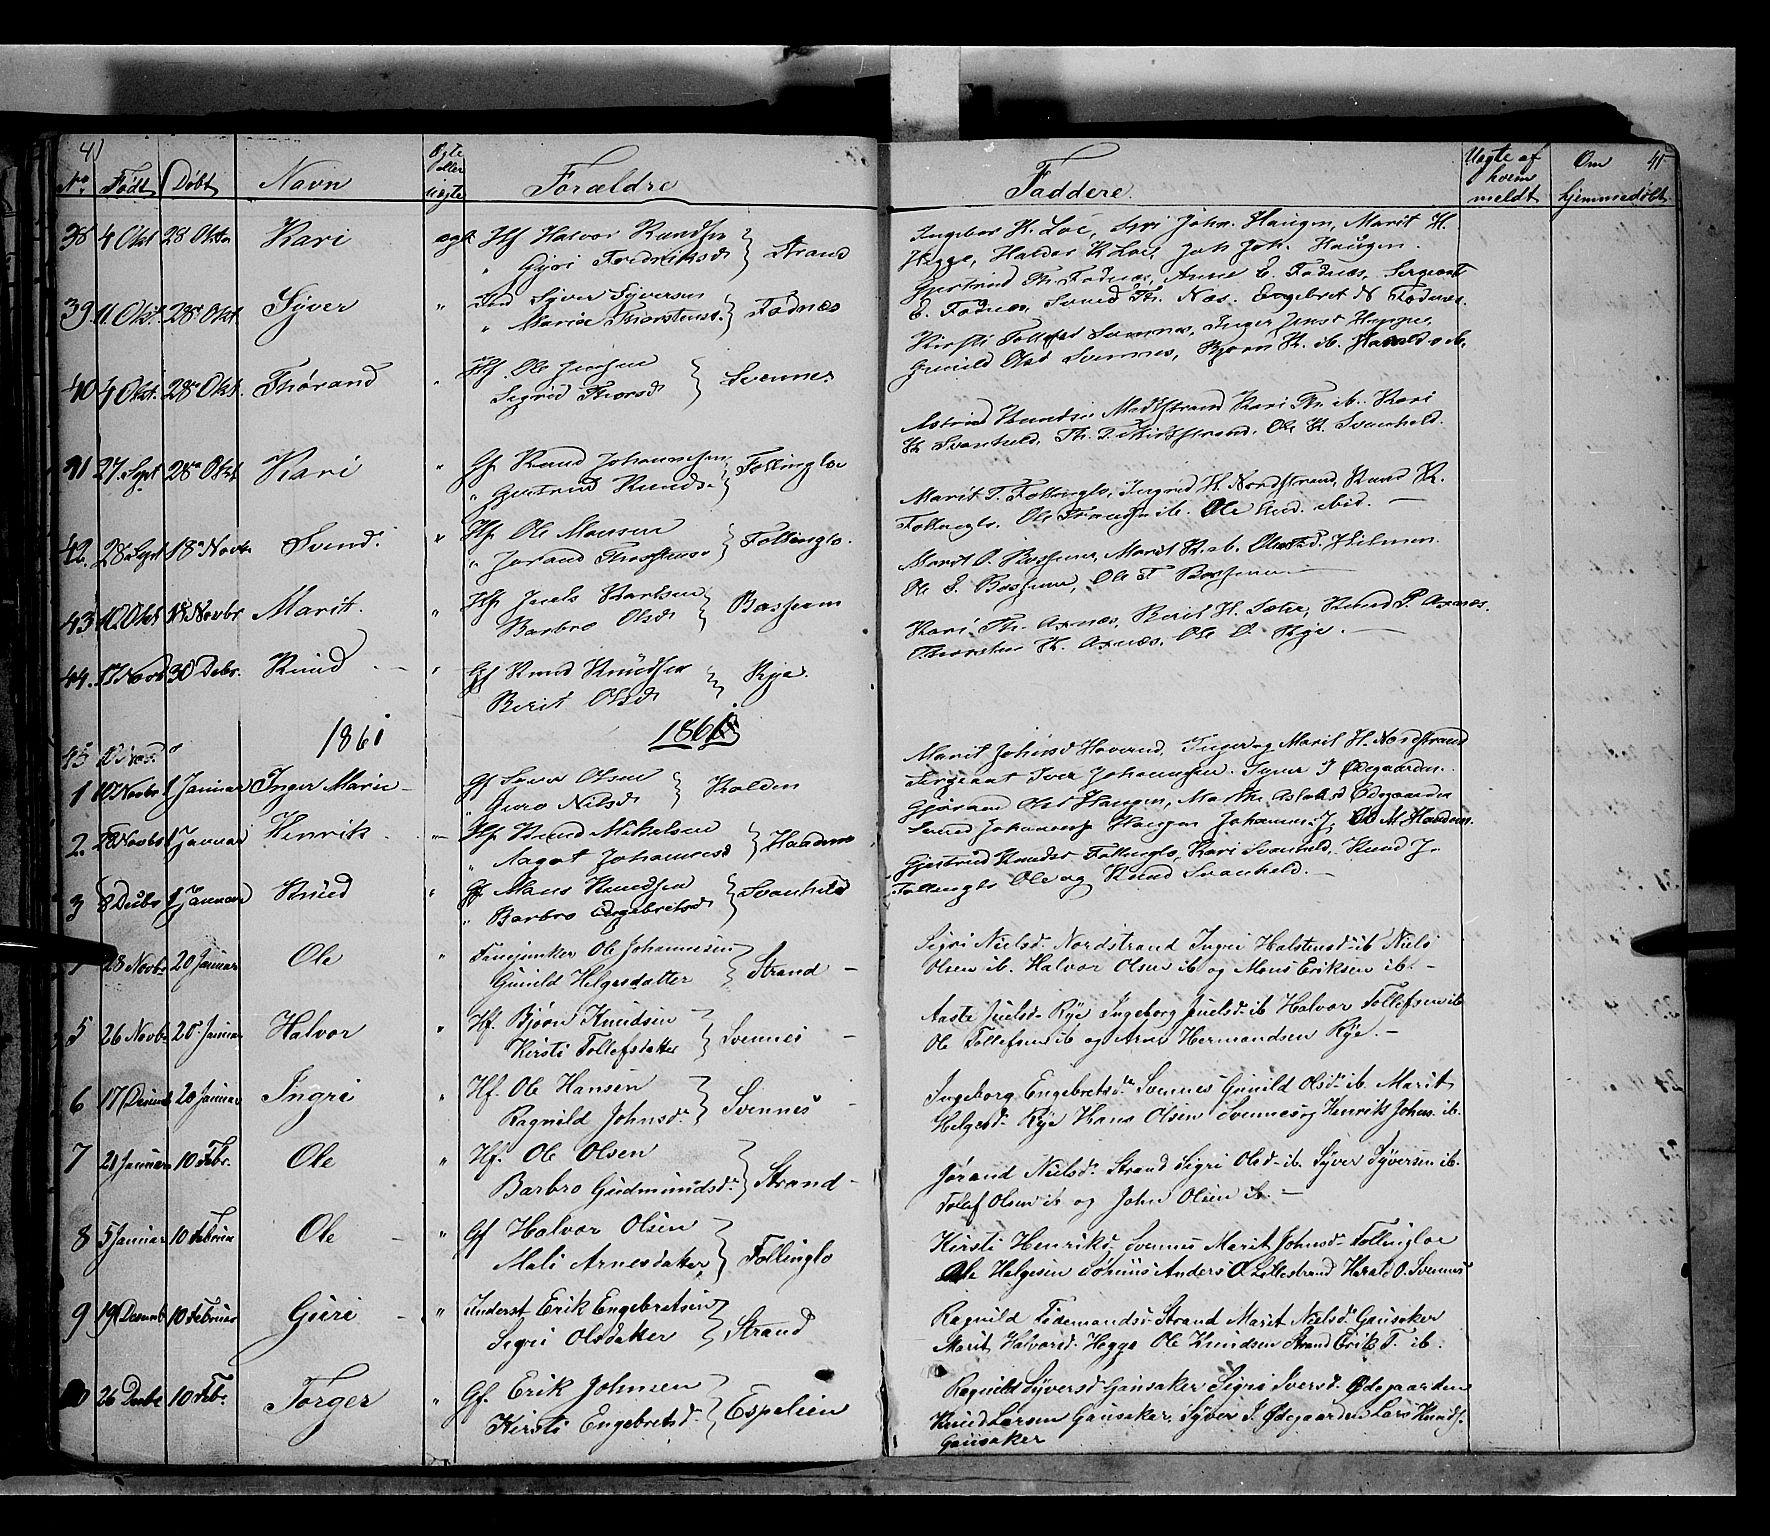 SAH, Nord-Aurdal prestekontor, Ministerialbok nr. 5, 1842-1863, s. 41